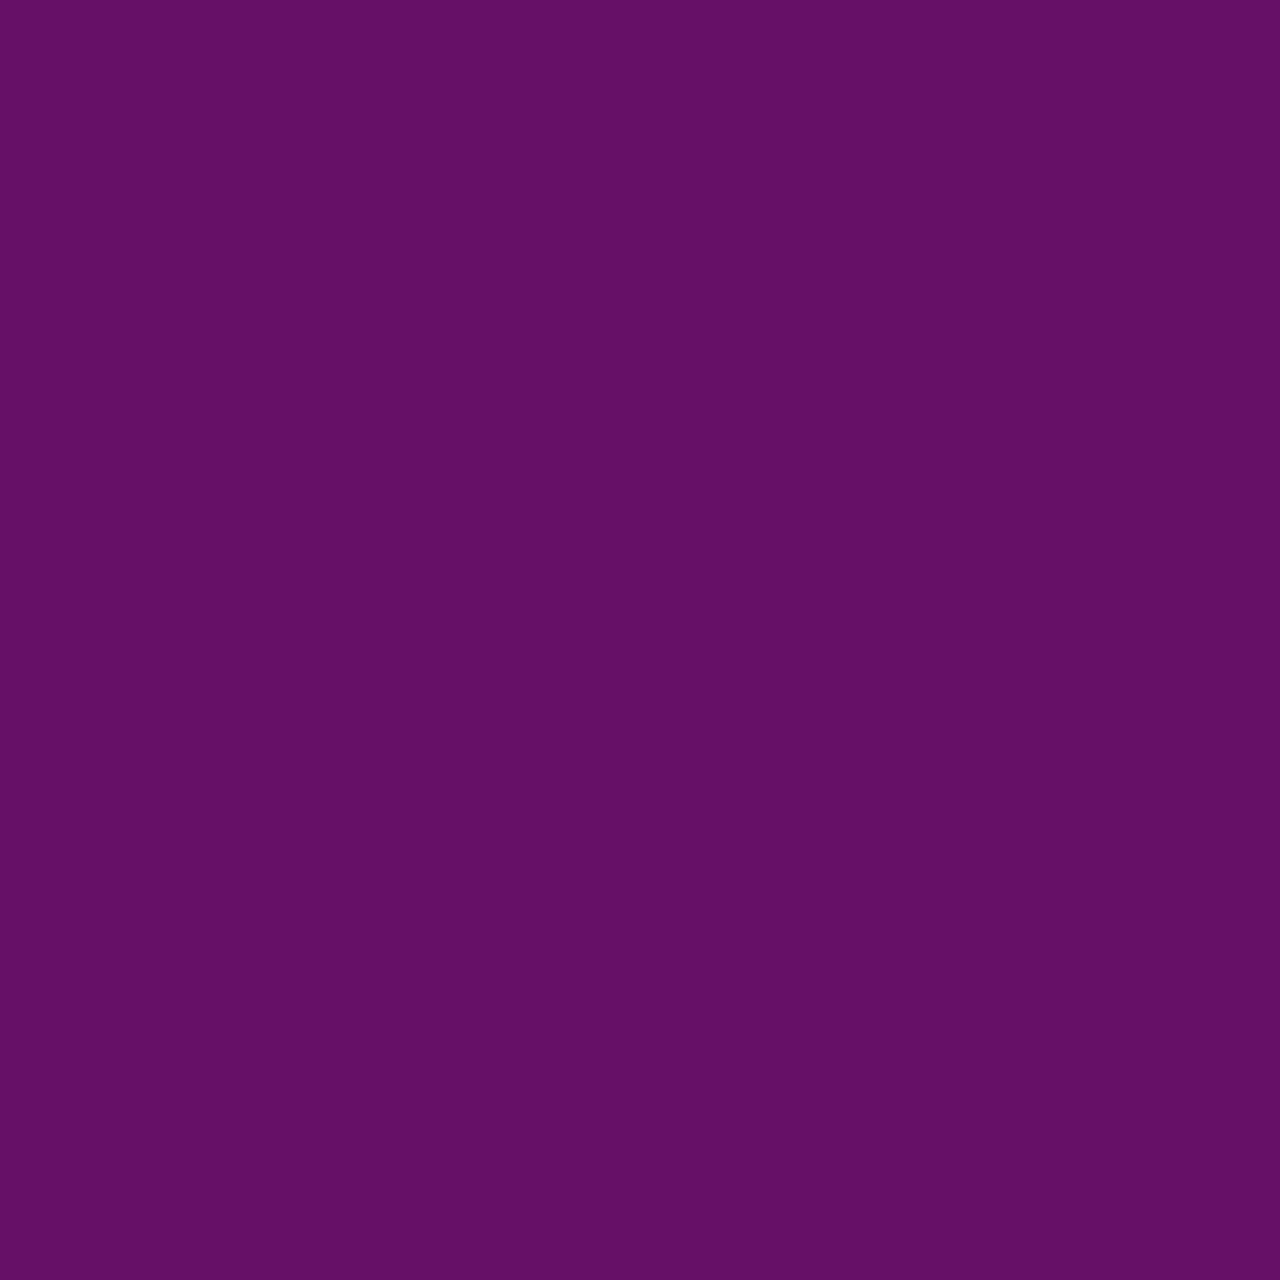 6304 Cr Tin Violet